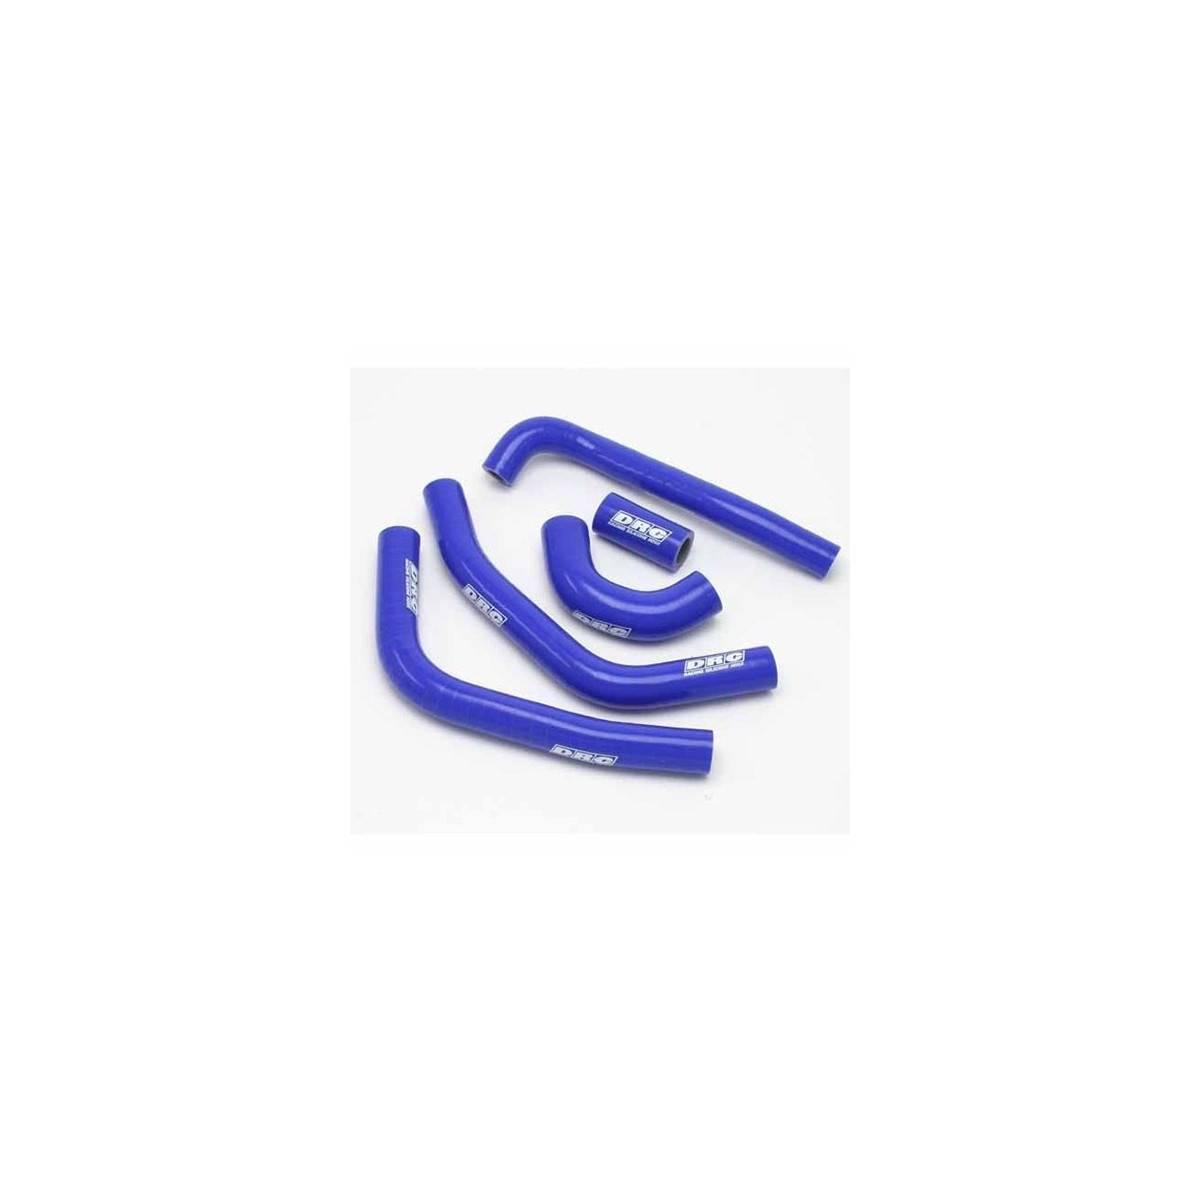 D47.01.953 - Kit Manguitos Radiador Husqvarna Fc250 350´16- Azul